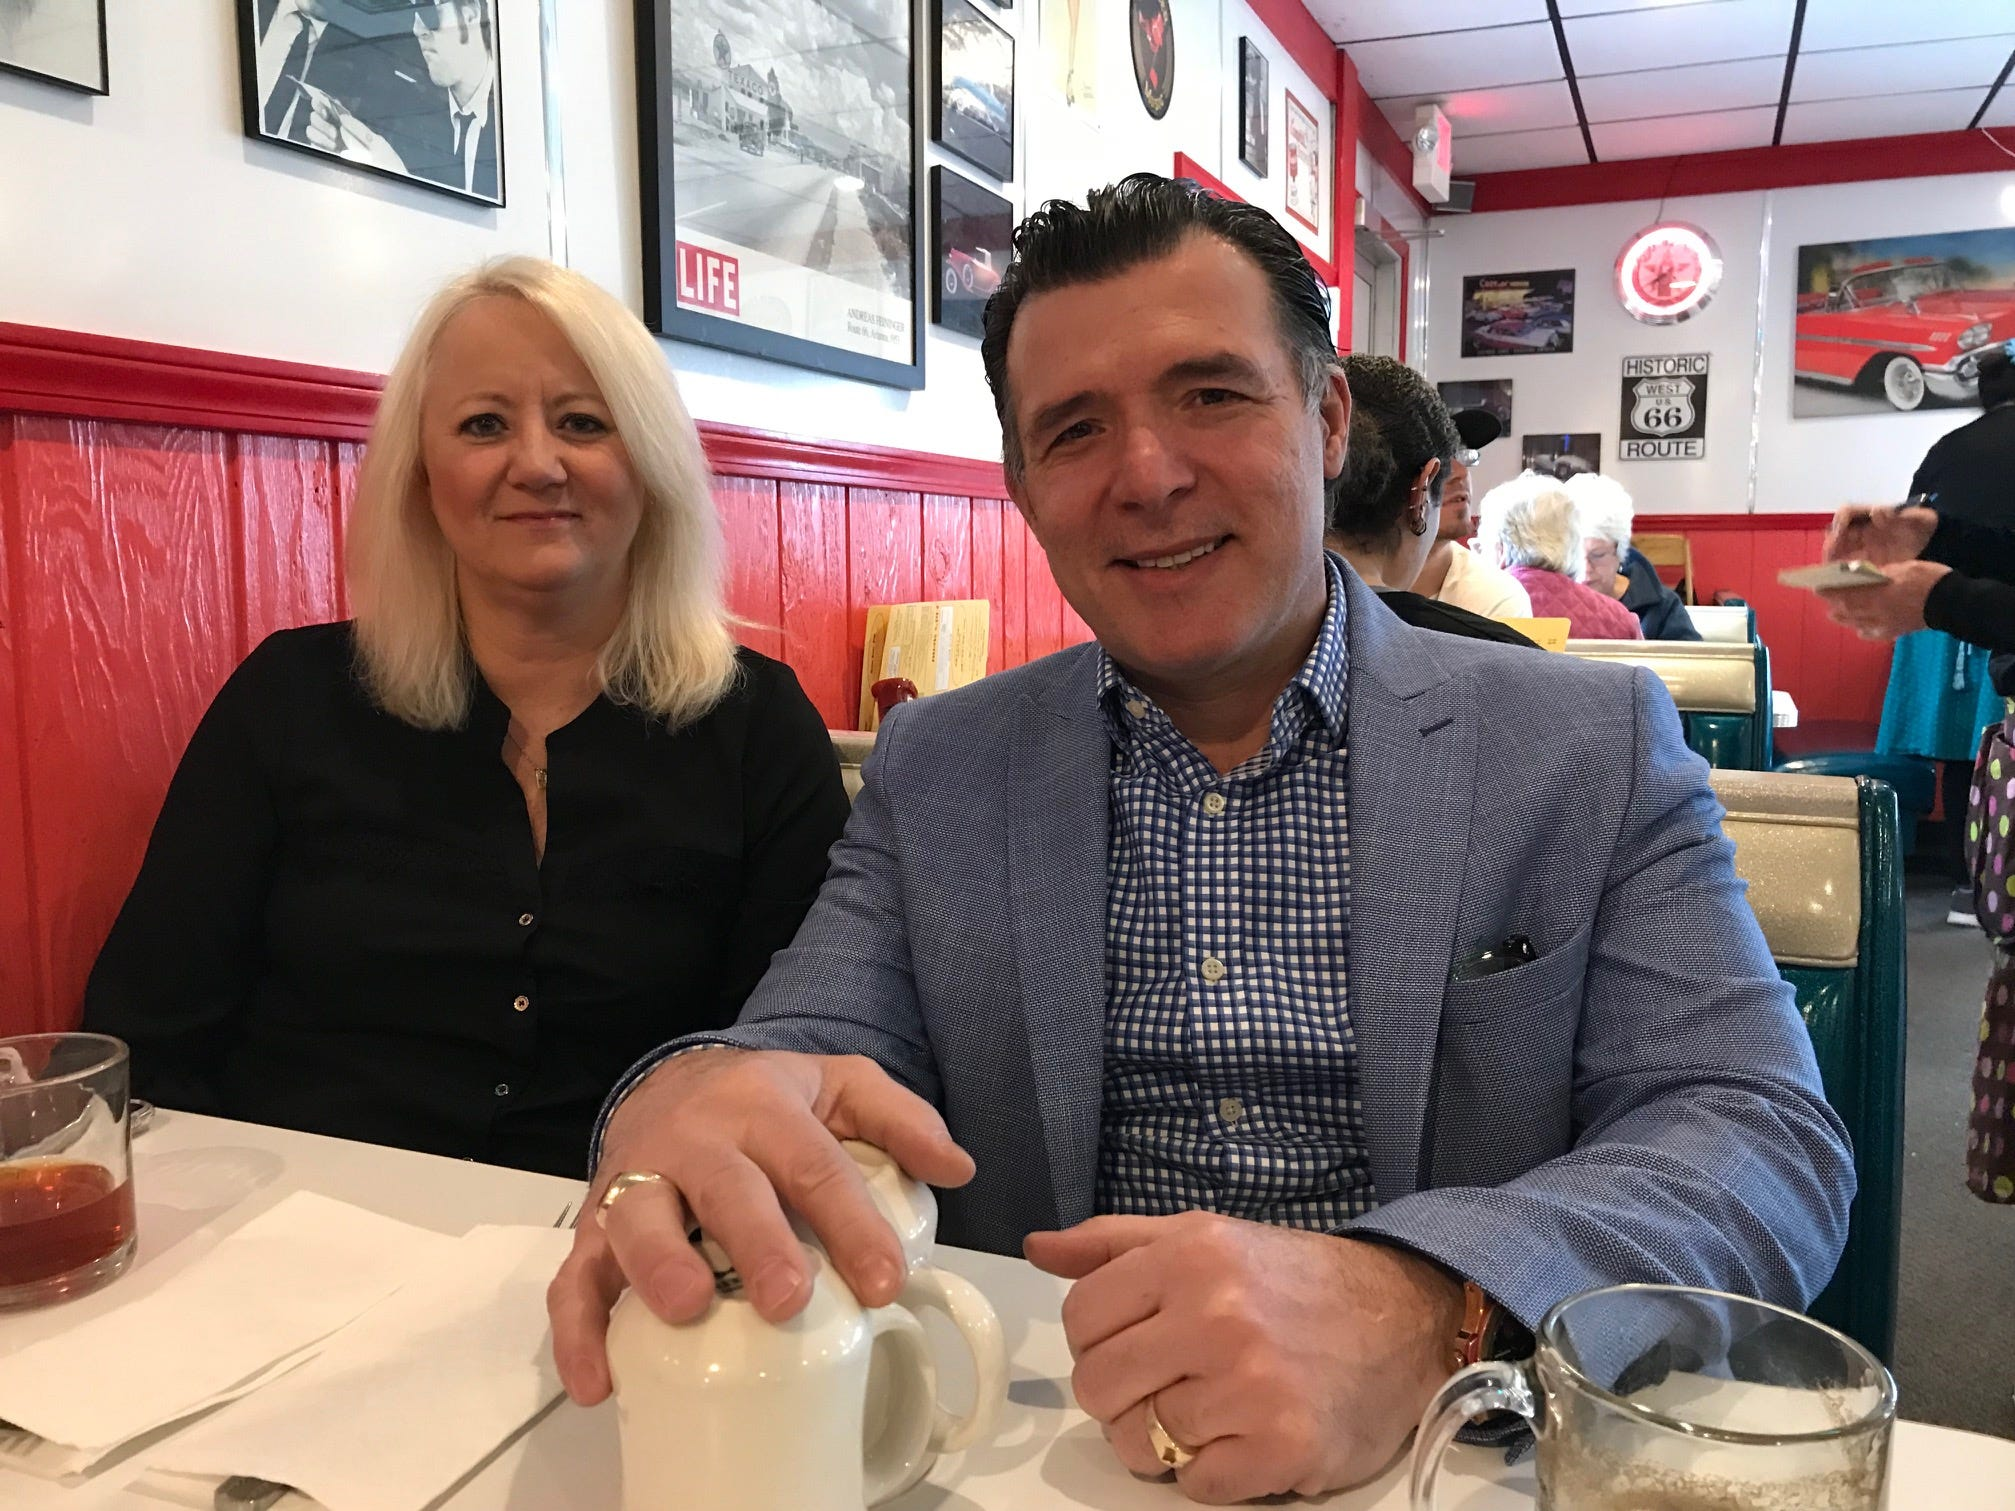 Christina Latifi and Harry Ljatifovski at Harry's Diner on Jan. 22, 2018.